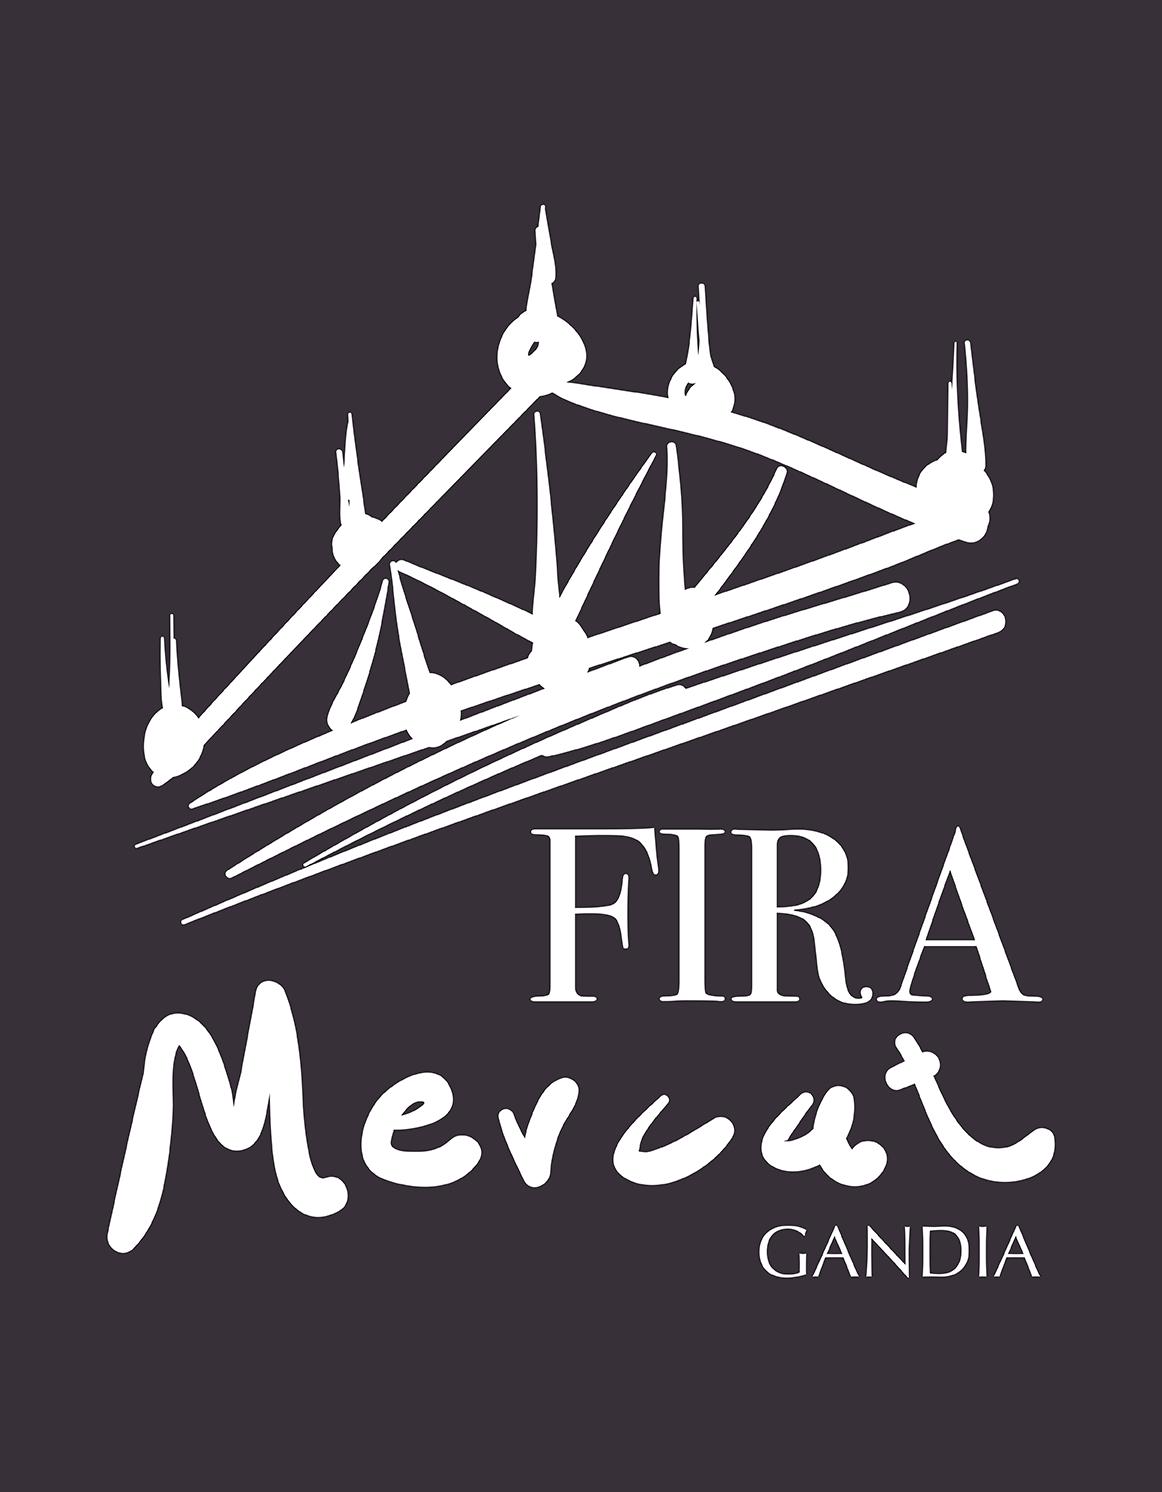 Fira Mercat Gandia